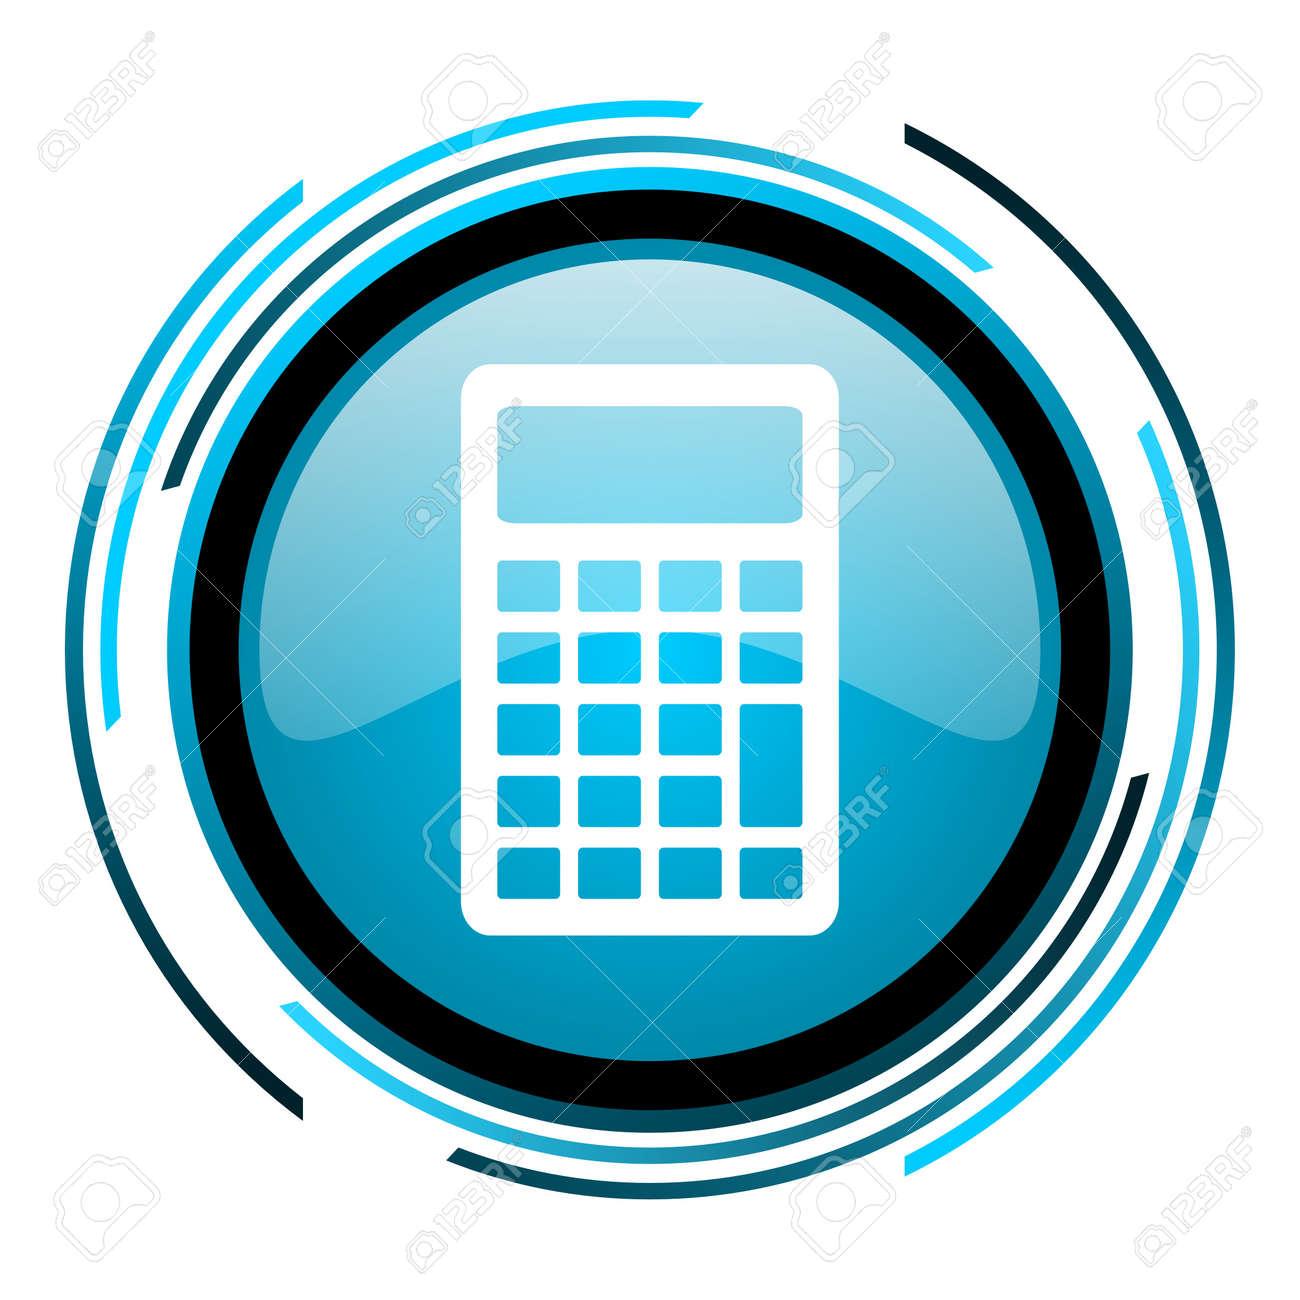 calculator blue circle glossy icon Stock Photo - 19705414